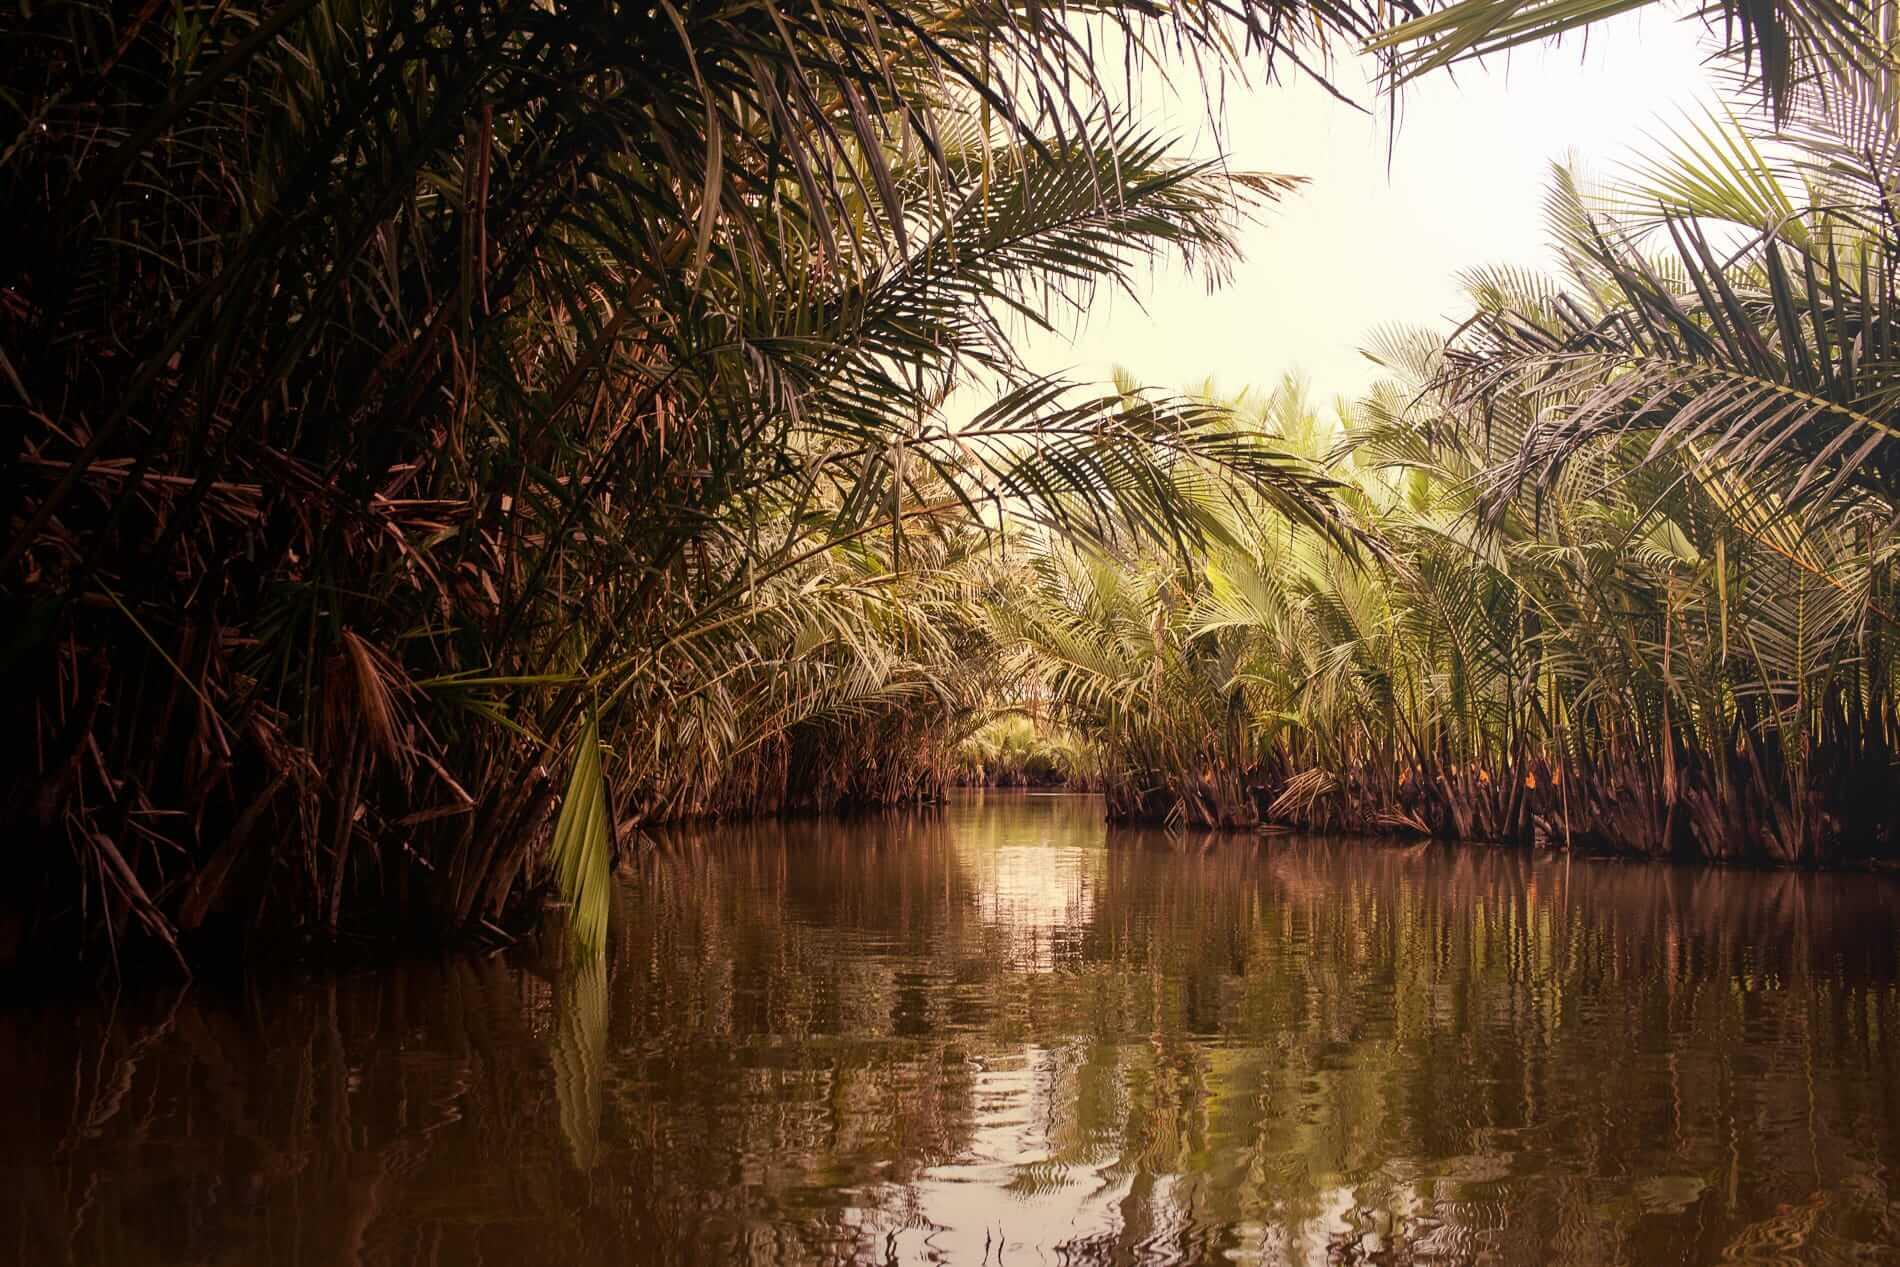 Palm trees and mangrove palms